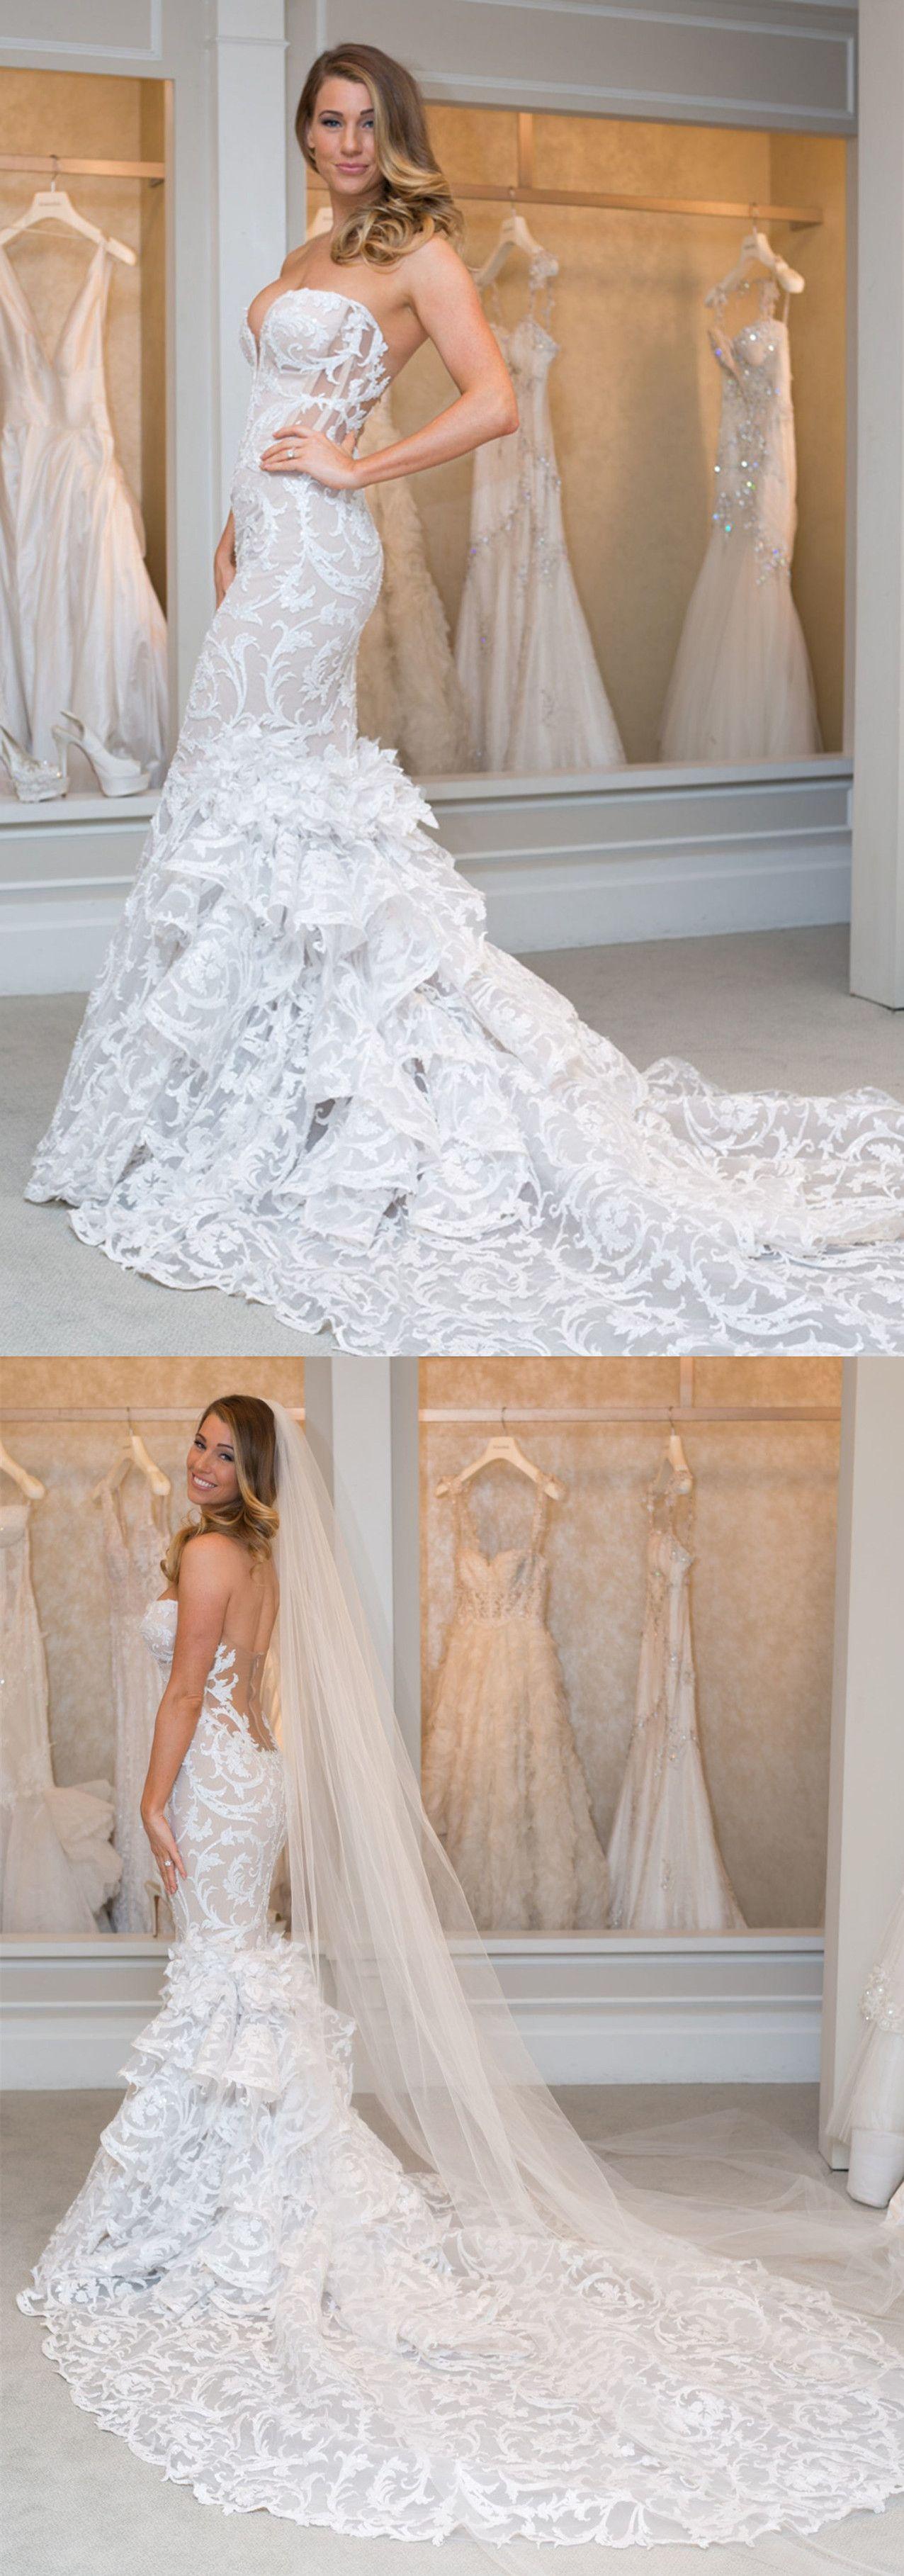 Mermaid sweetheart court train tiered lace wedding dress wedding